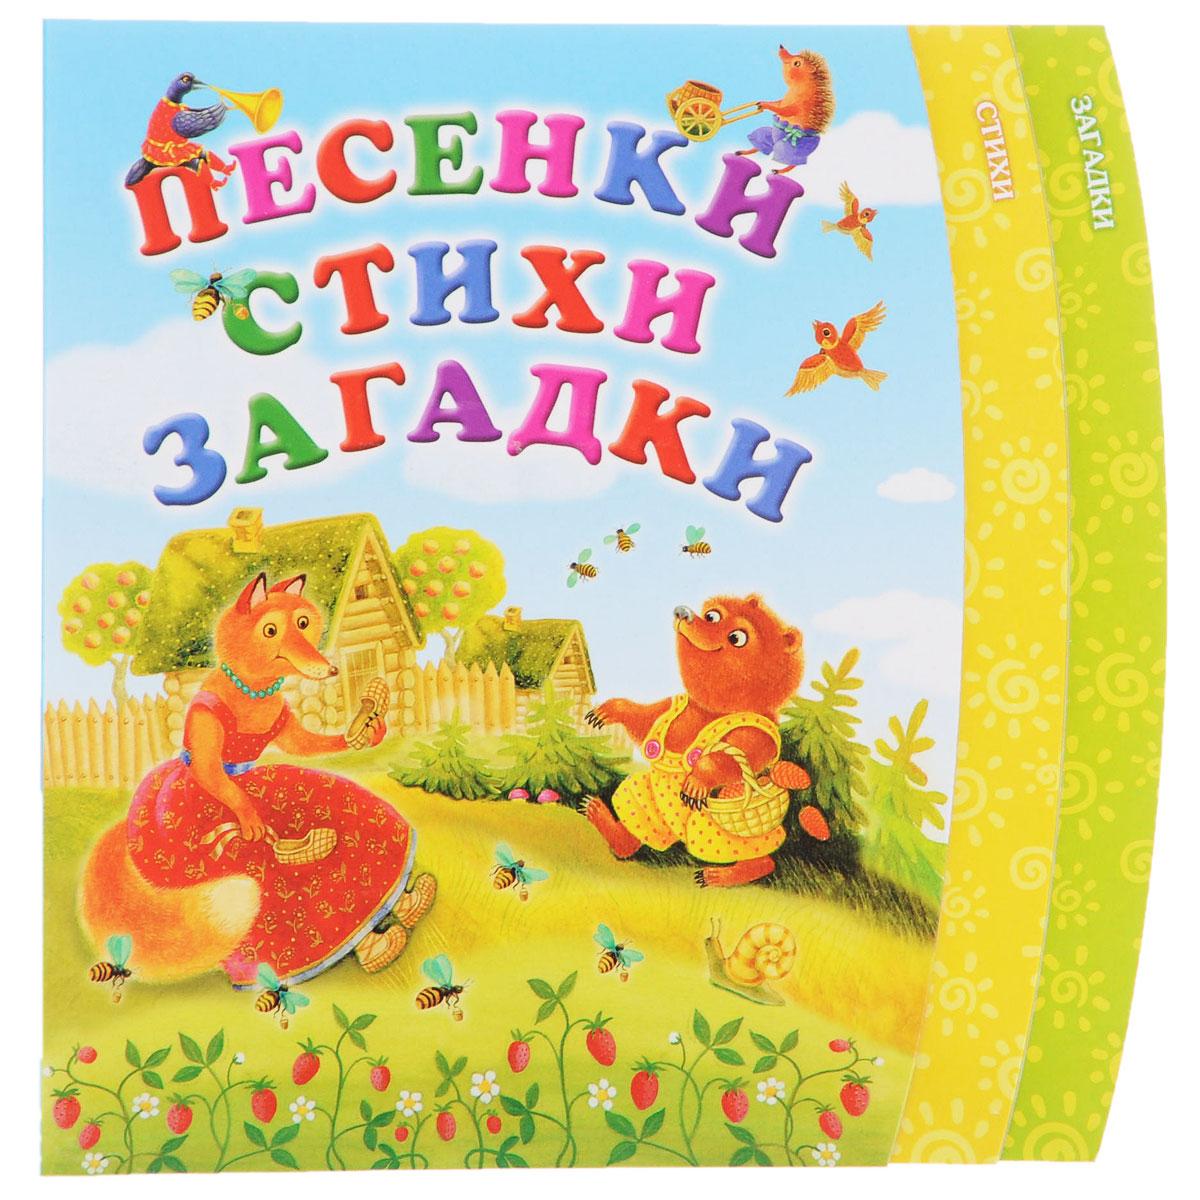 В. А. Степанов, Ю. В. Гурин, Н. В. Пикулева, Л. Л. Фадеева Песенки. Стихи. Загадки